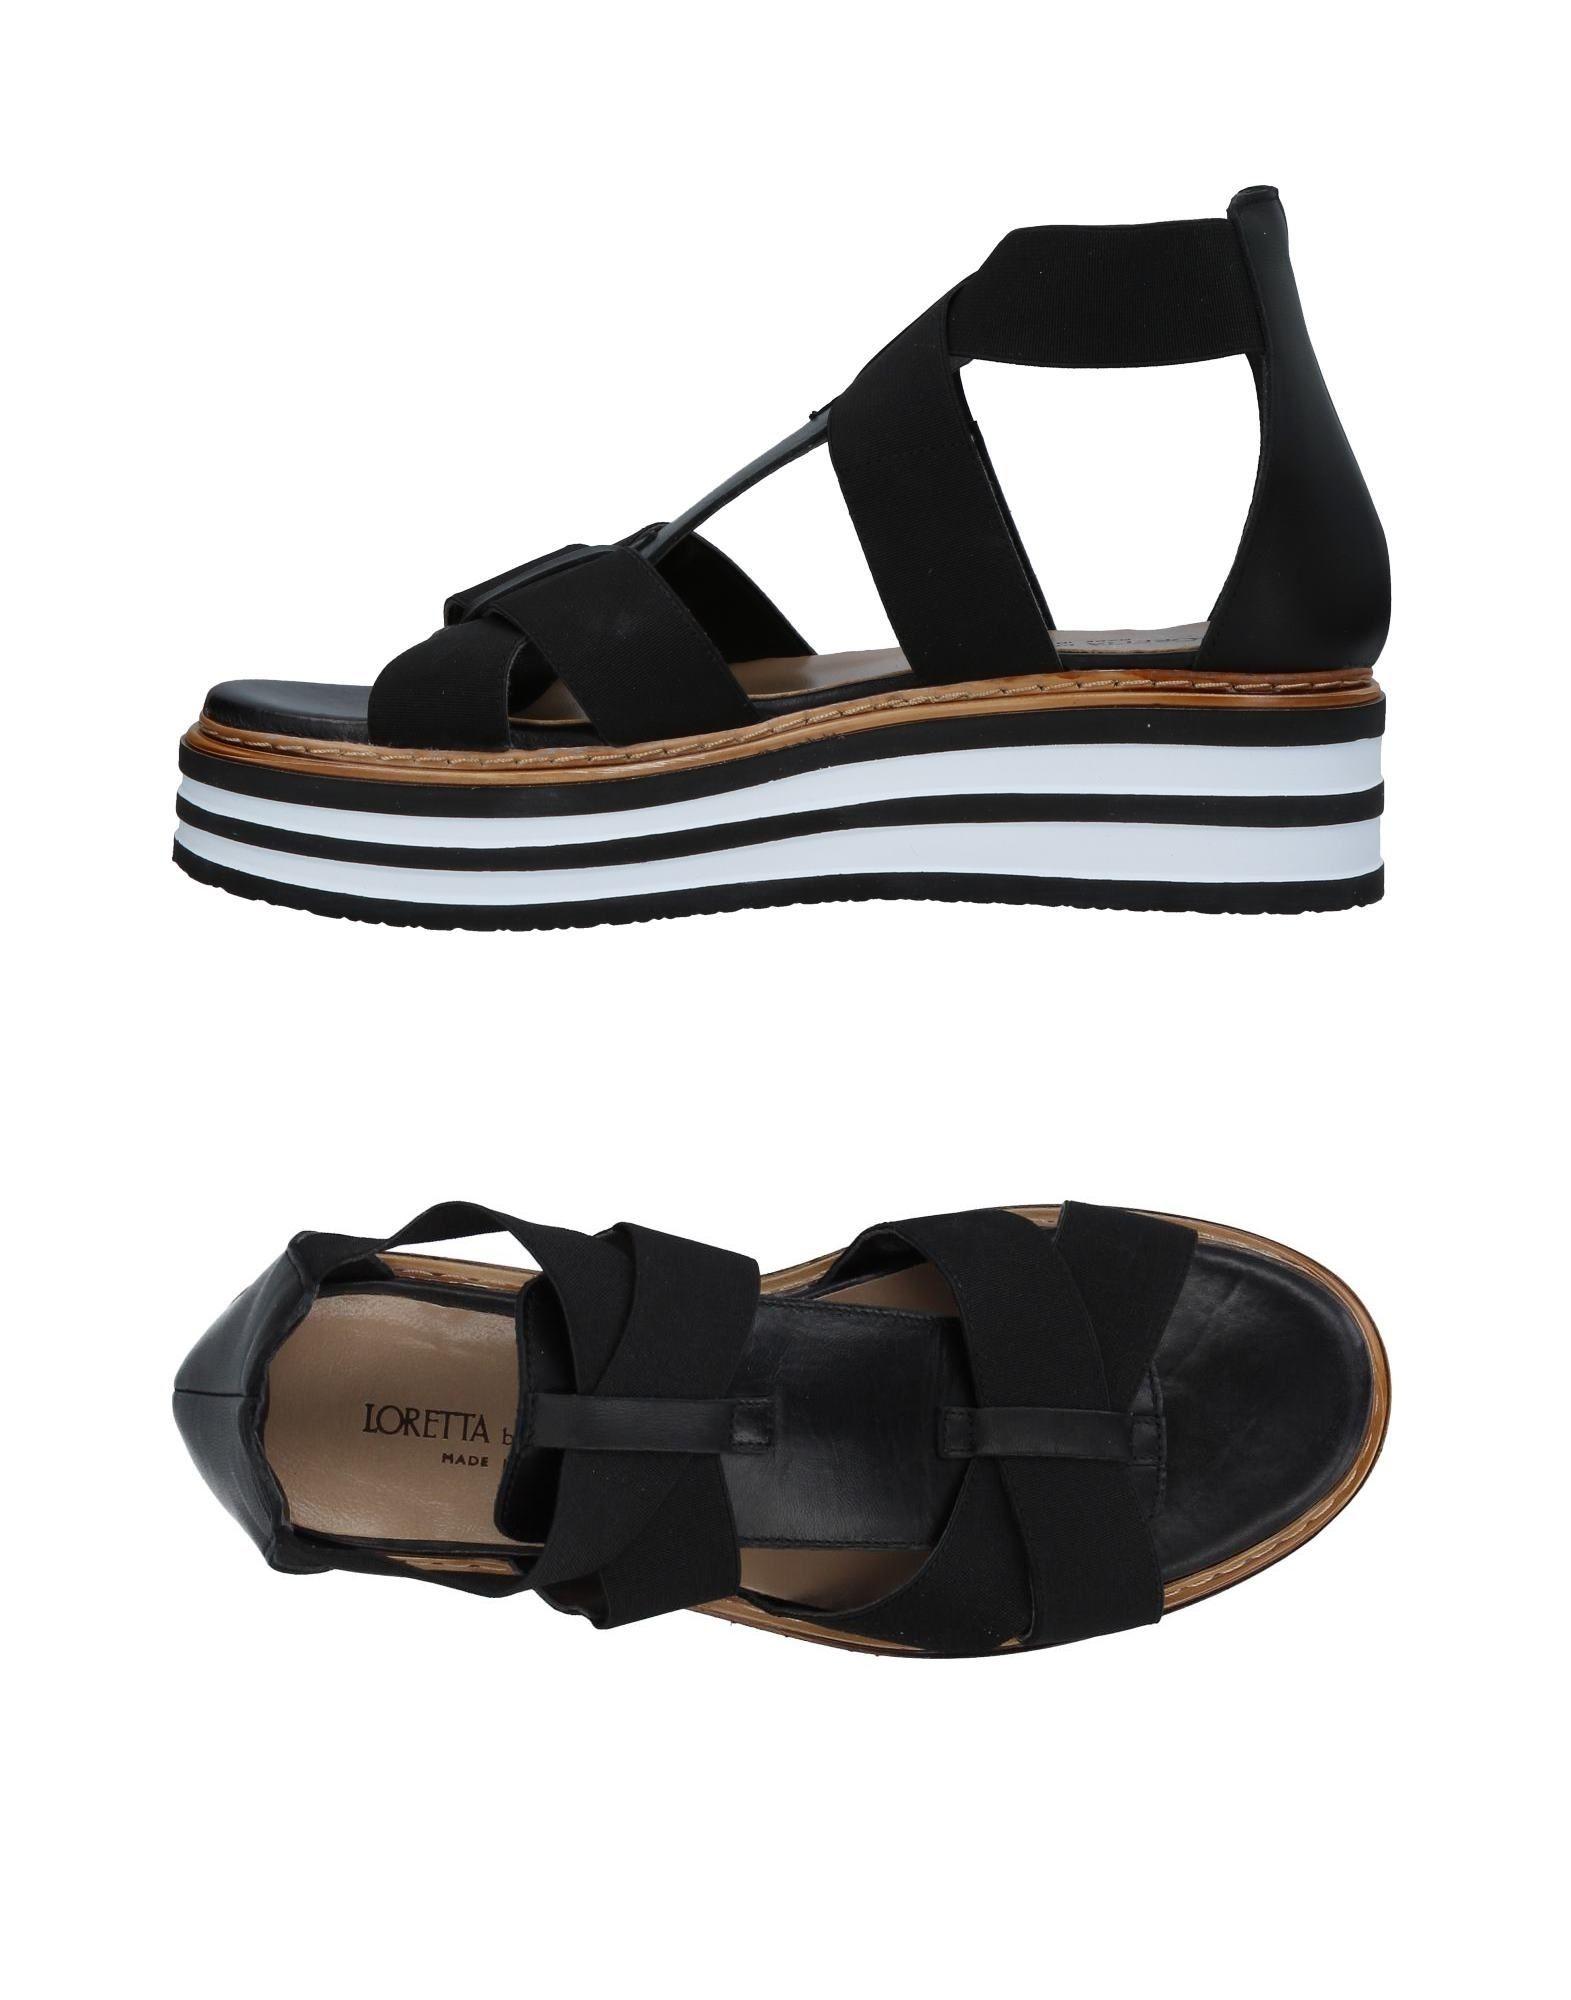 Loretta By Loretta Loretta By Sandalen Damen 11374151LM Gute Qualität beliebte Schuhe 5941ce